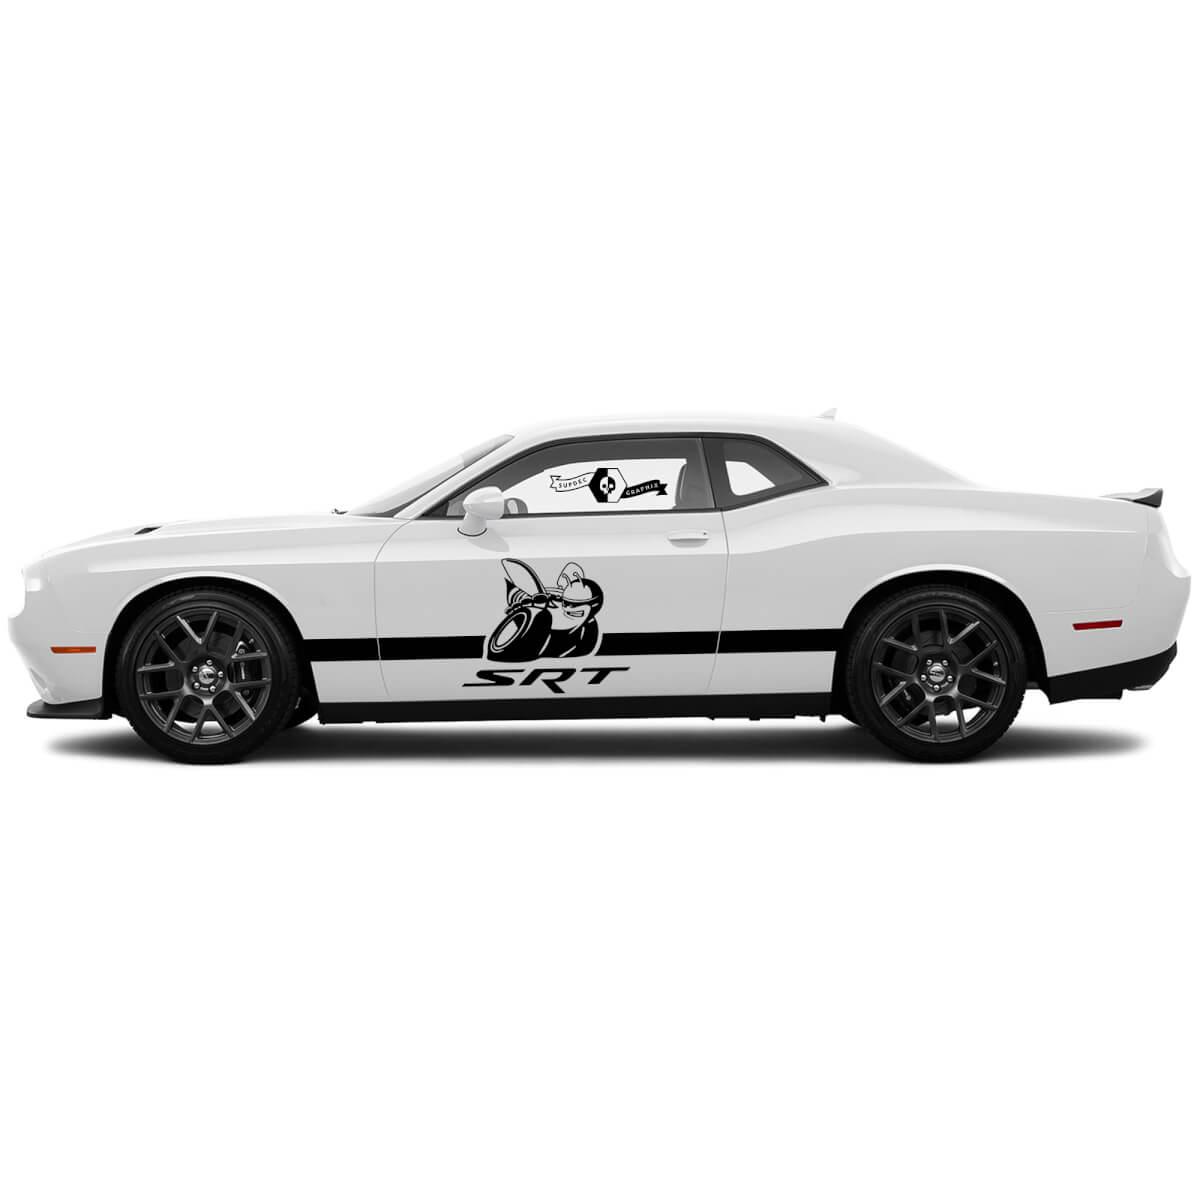 SRT Scat Pack Line Side Decals für Dodge Challenger oder Ladegerät Vinyl Aufkleber Aufkleber